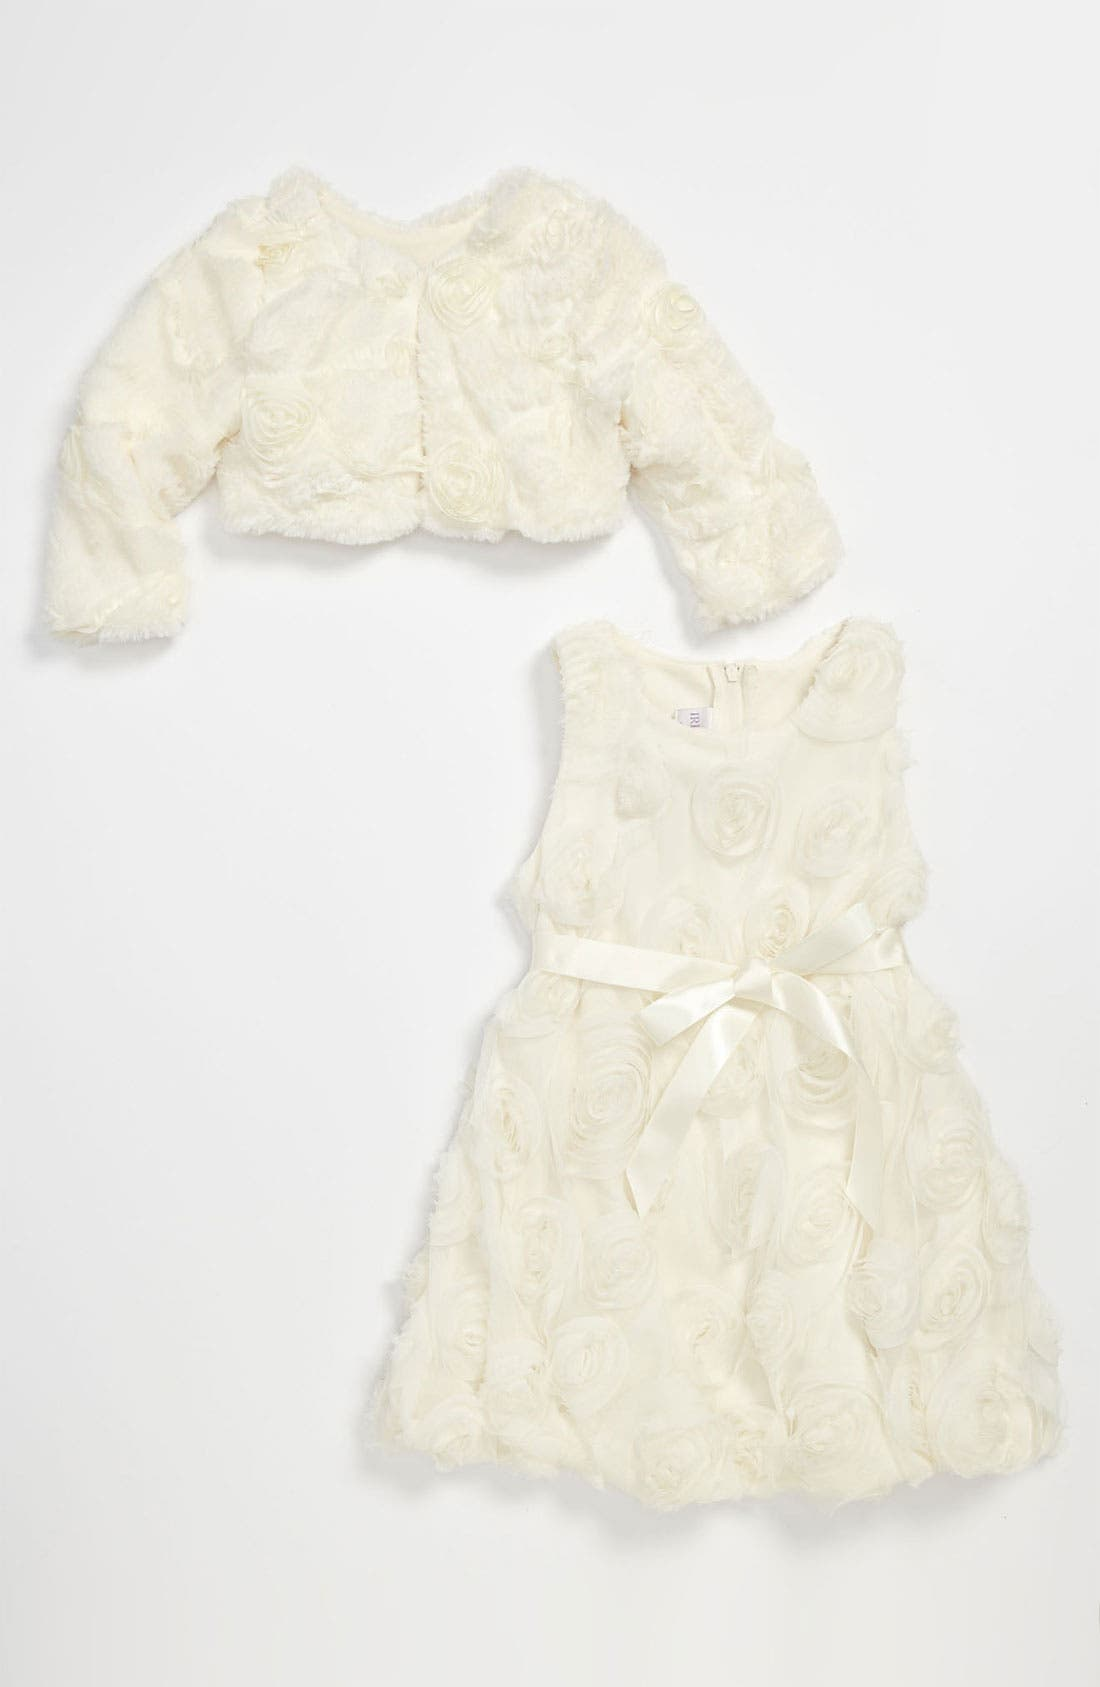 Alternate Image 1 Selected - Iris & Ivy Rosette Dress & Faux Fur Bolero (Toddler)